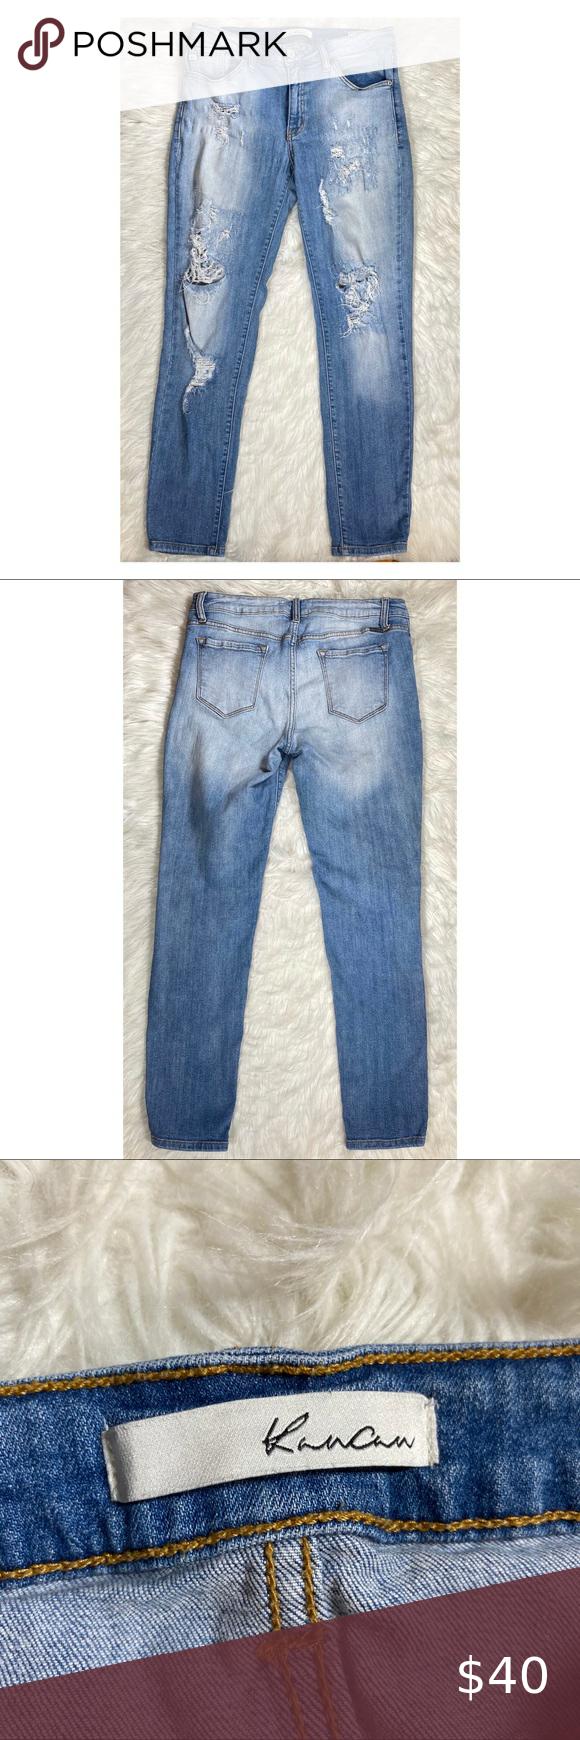 Kancan Distressed Jeans W13 30 Medium Light Wash Denim Jeans Distressed Hole Skinny Jeans Brand Kancan Si Distressed Jeans Washed Denim Jeans Jeans Brands